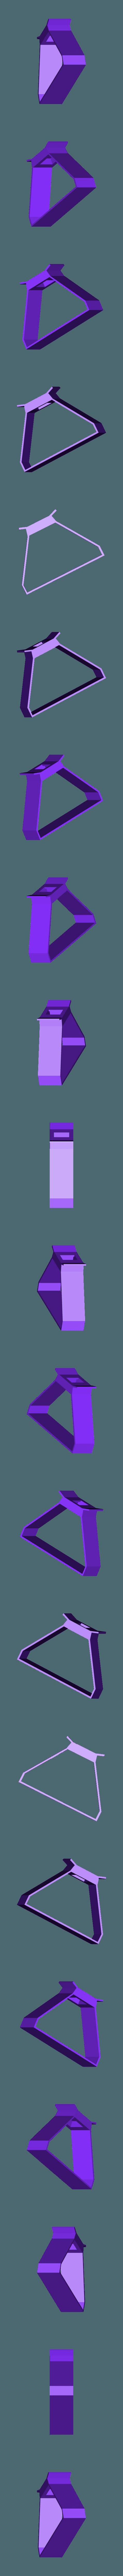 picus lamp1 by ctrl design.stl Download free STL file LED LIGHT • 3D printer model, Byctrldesign